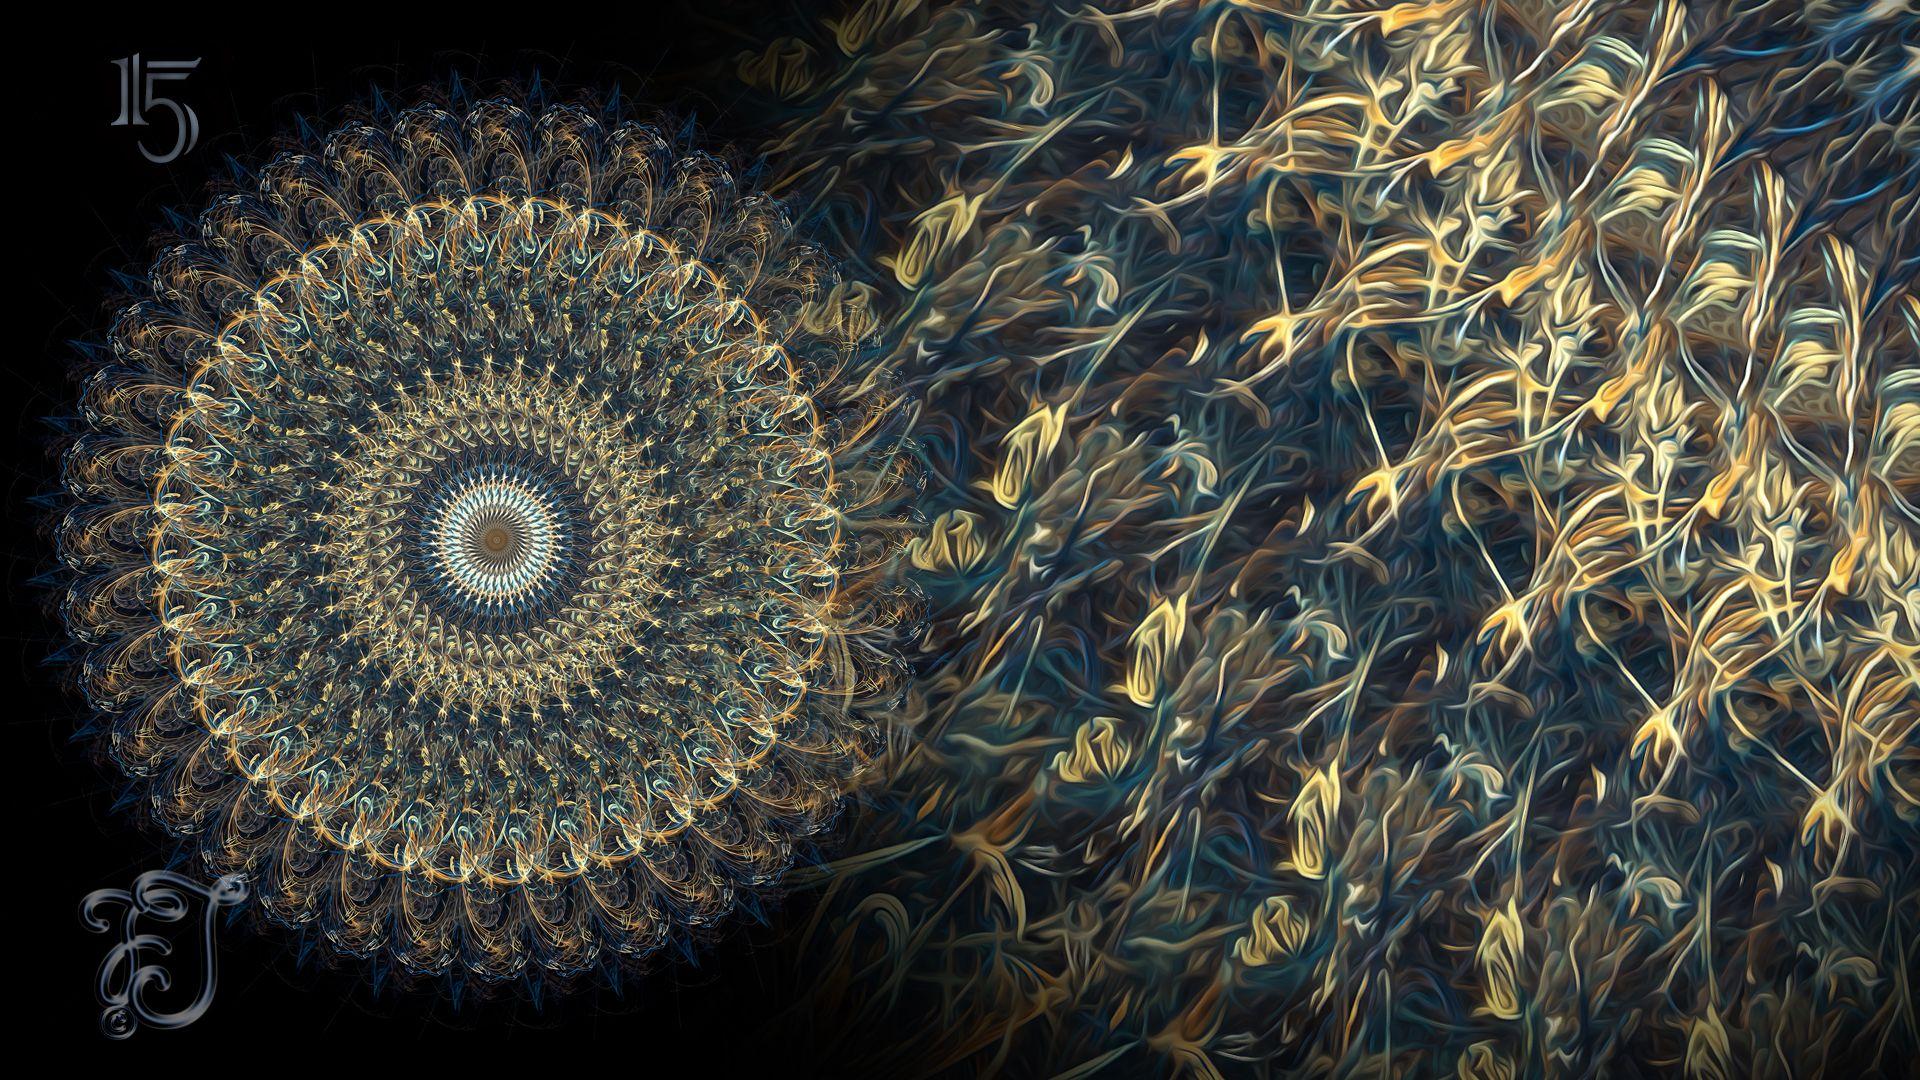 pin von frank jungblut auf mandalas  leinwand papier